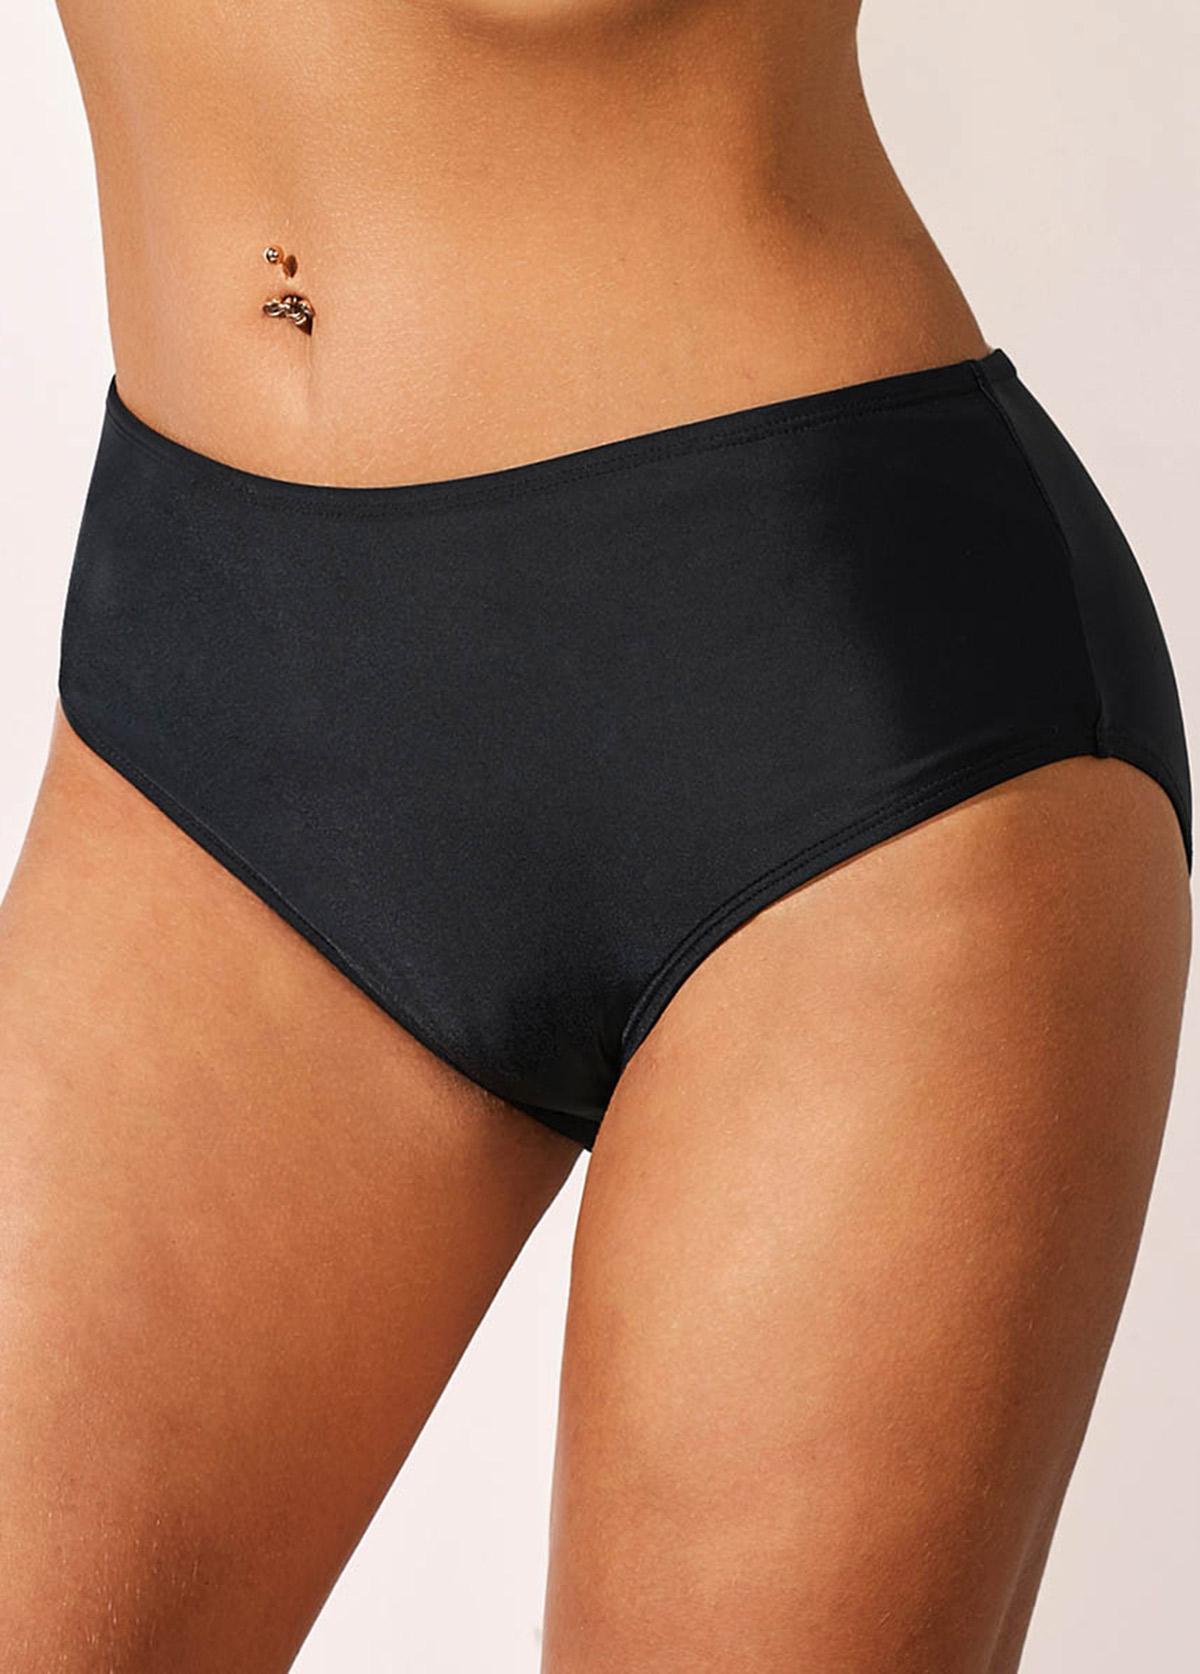 Mid waist Carry Buttock Black Swimwear Panty